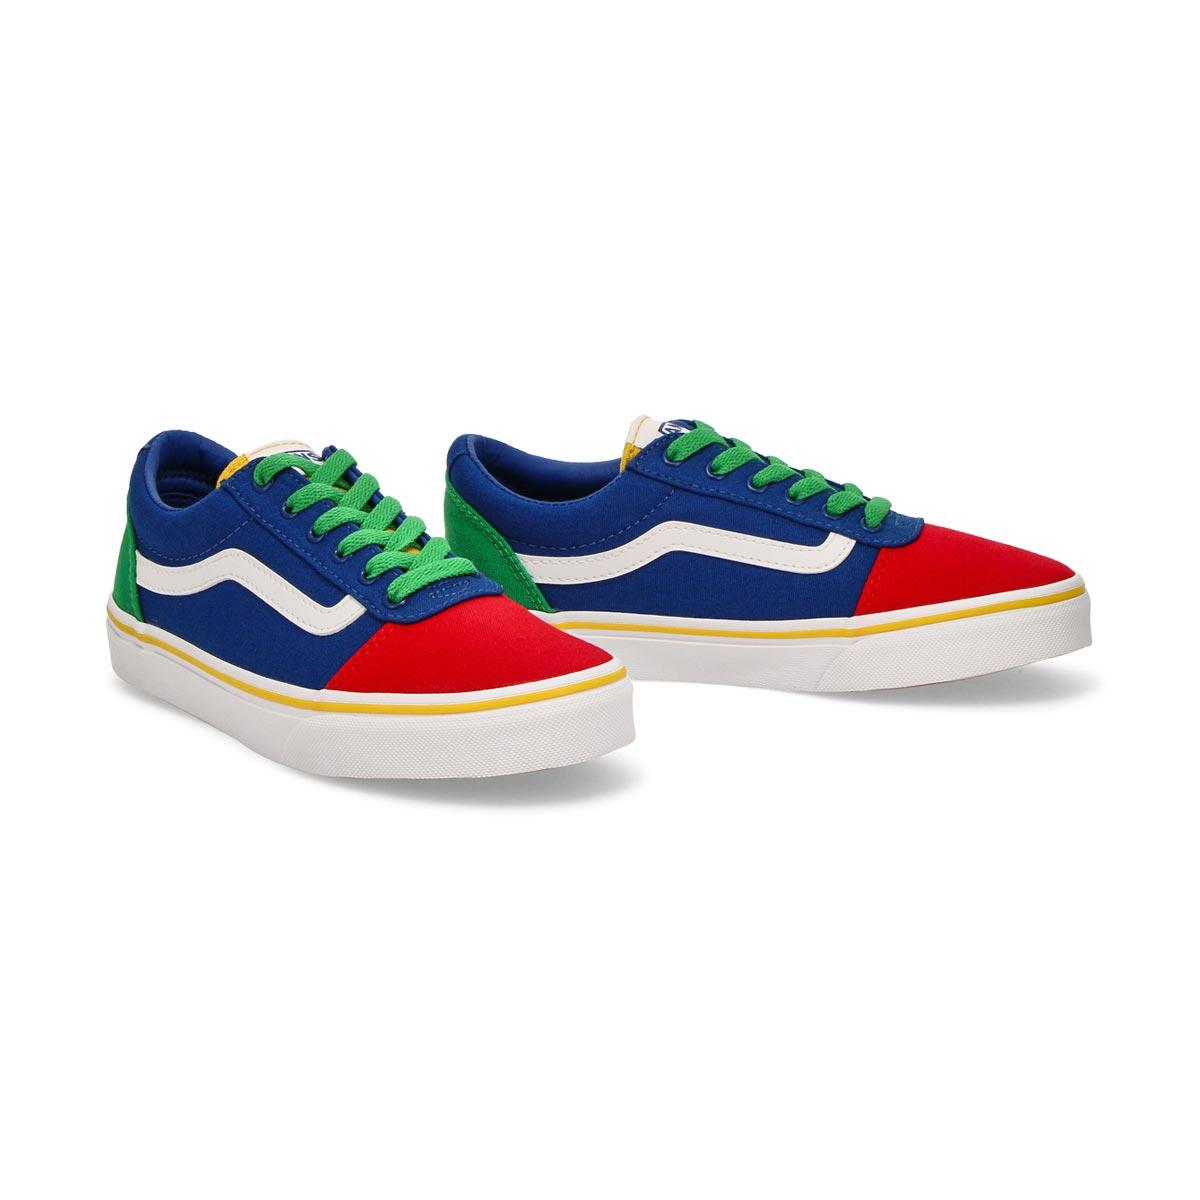 Boys' Ward Sneaker - Colour Block Multi